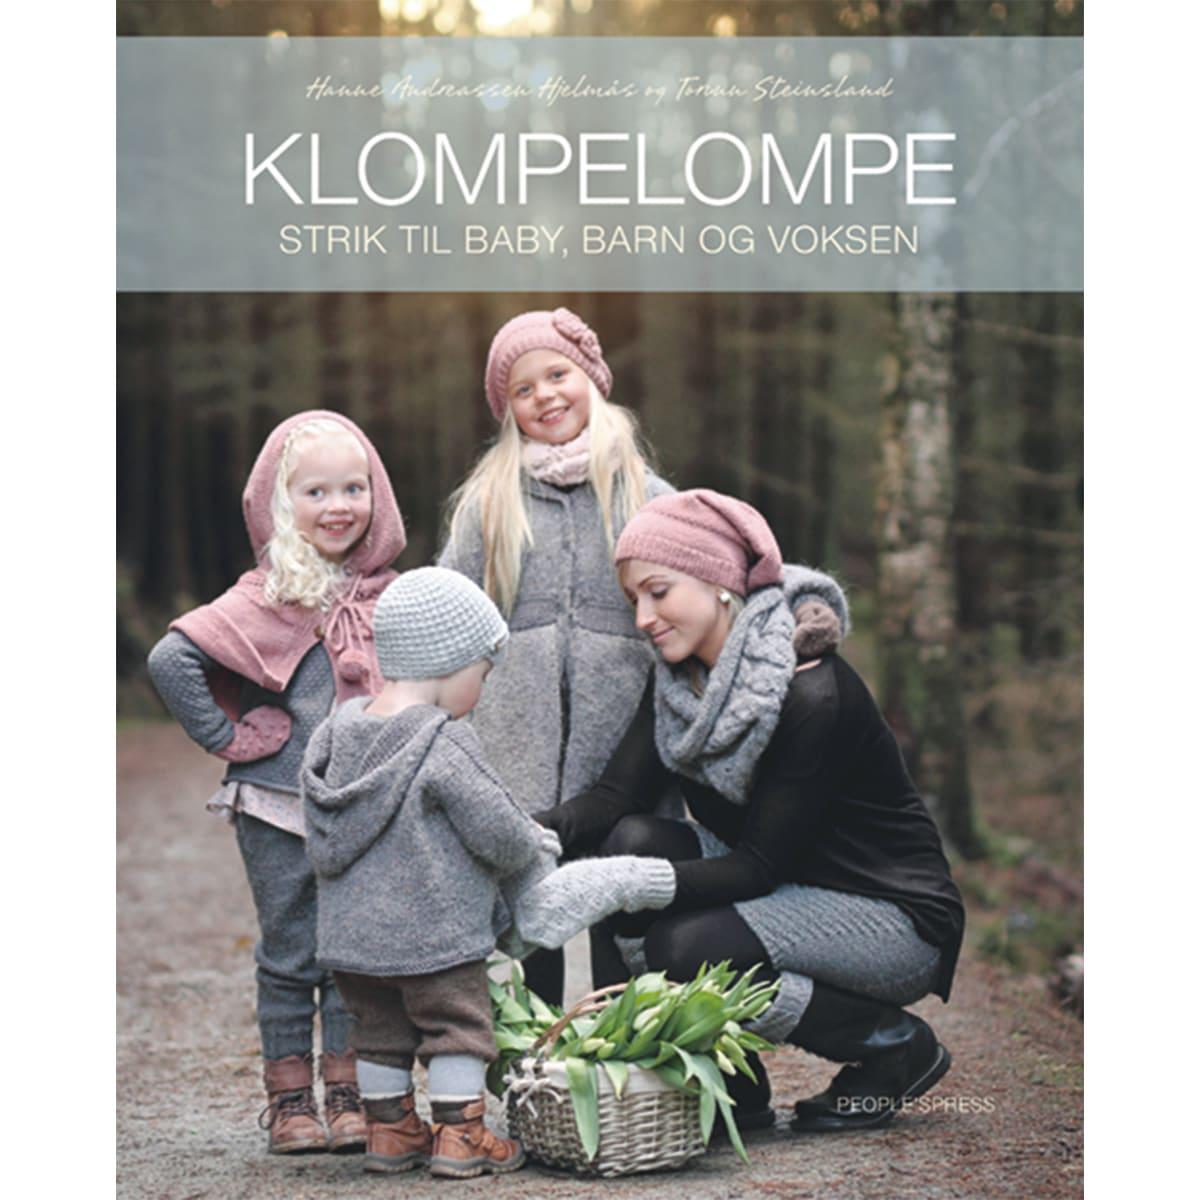 Af Hanne Andreassen Hjelmås & Torunn Steinsland